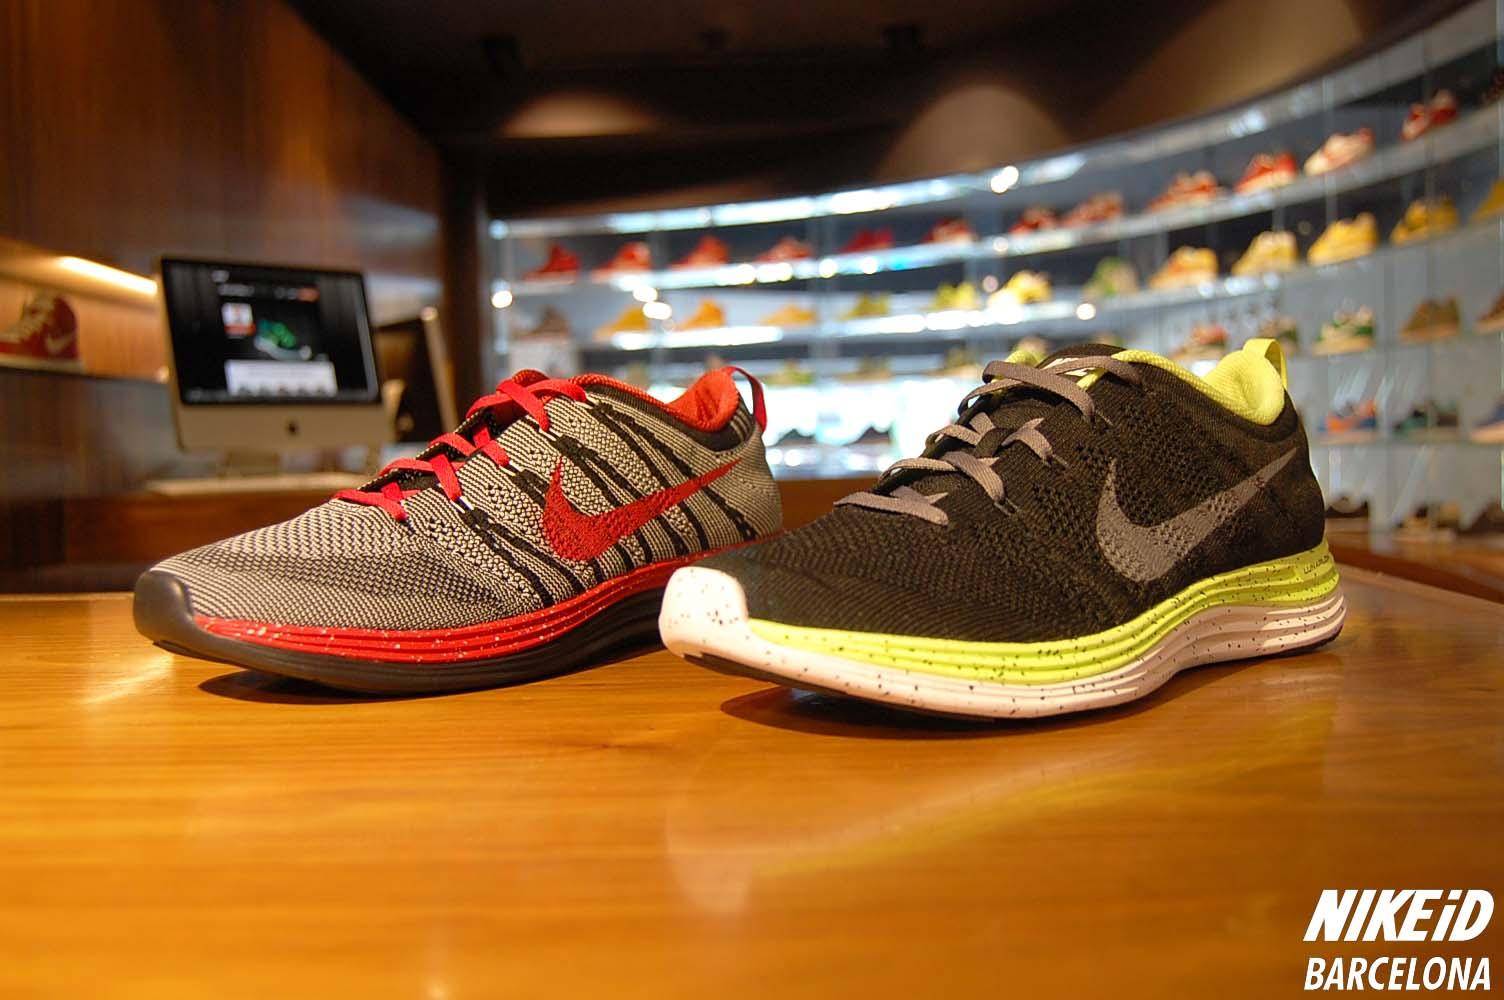 Nike iD Lunar Max 1 x FC Barcelona